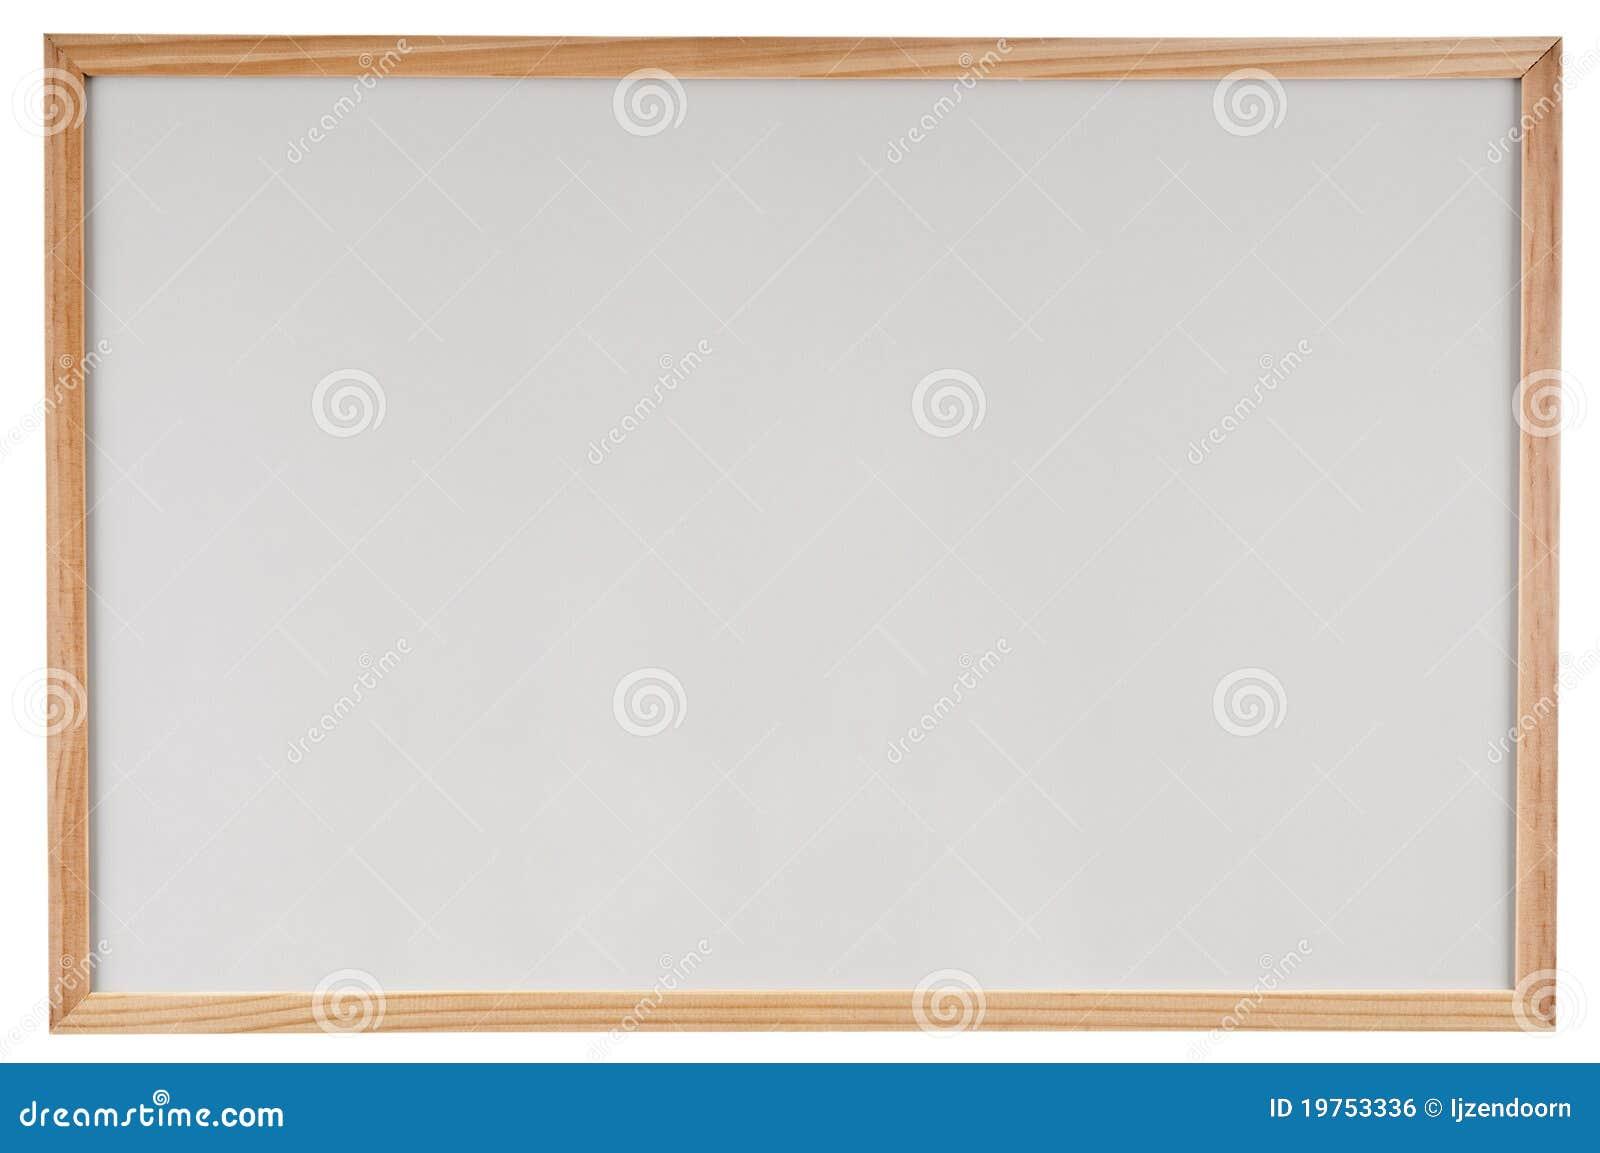 tableau d 39 affichage photo stock image du personne. Black Bedroom Furniture Sets. Home Design Ideas